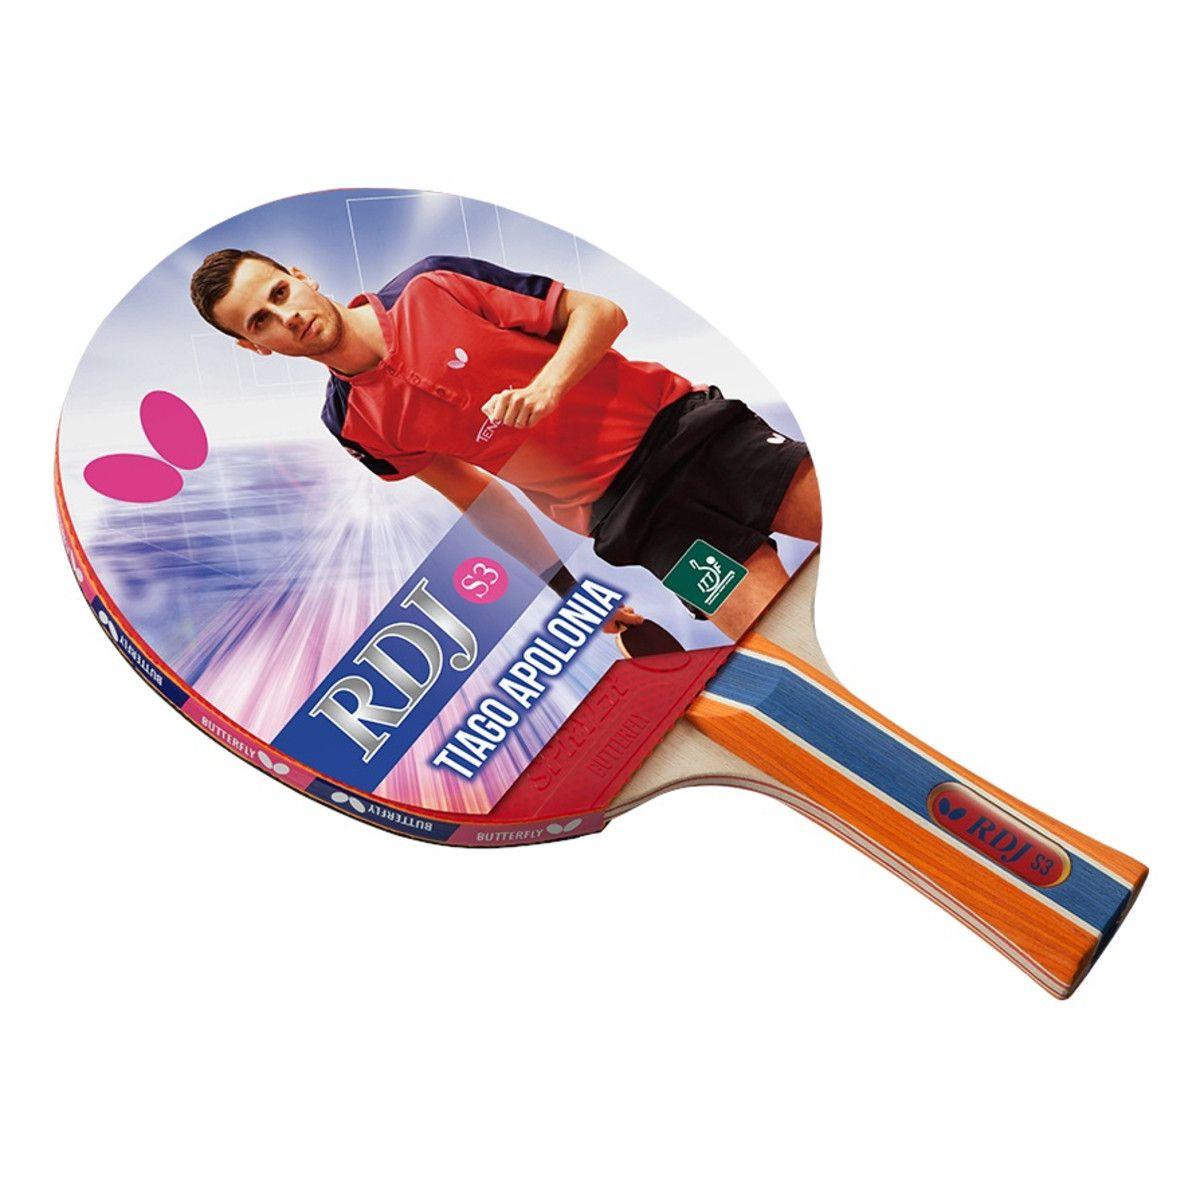 Raquete de tenis de Mesa Butterfly RDJ S3 - Tiago Apolonia + Brinde 3 Bolinhas  - REAL ESPORTE